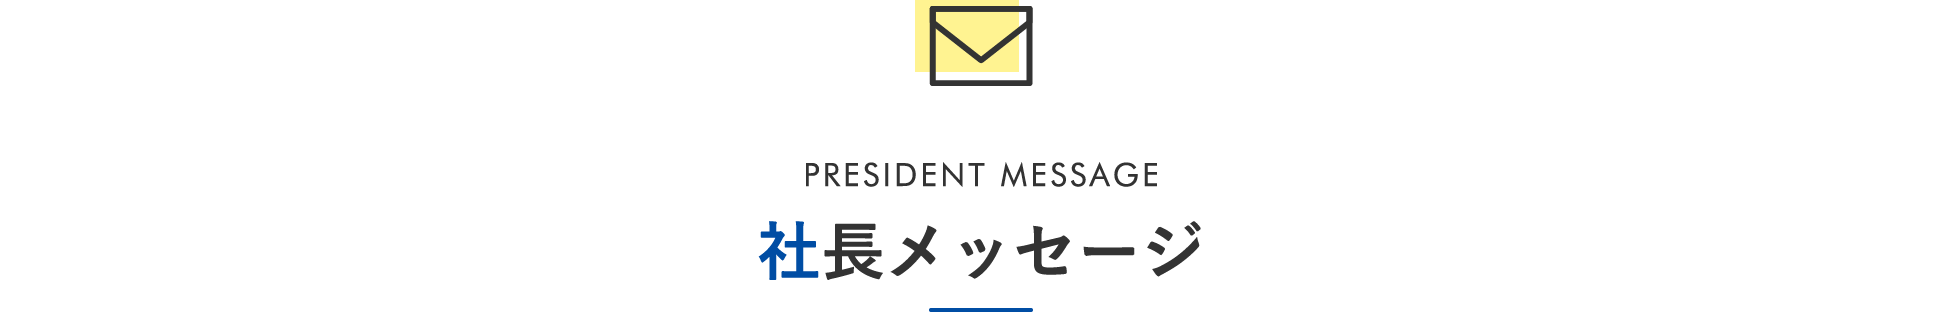 PRESIDENT MESSAGE 社長メッセージ